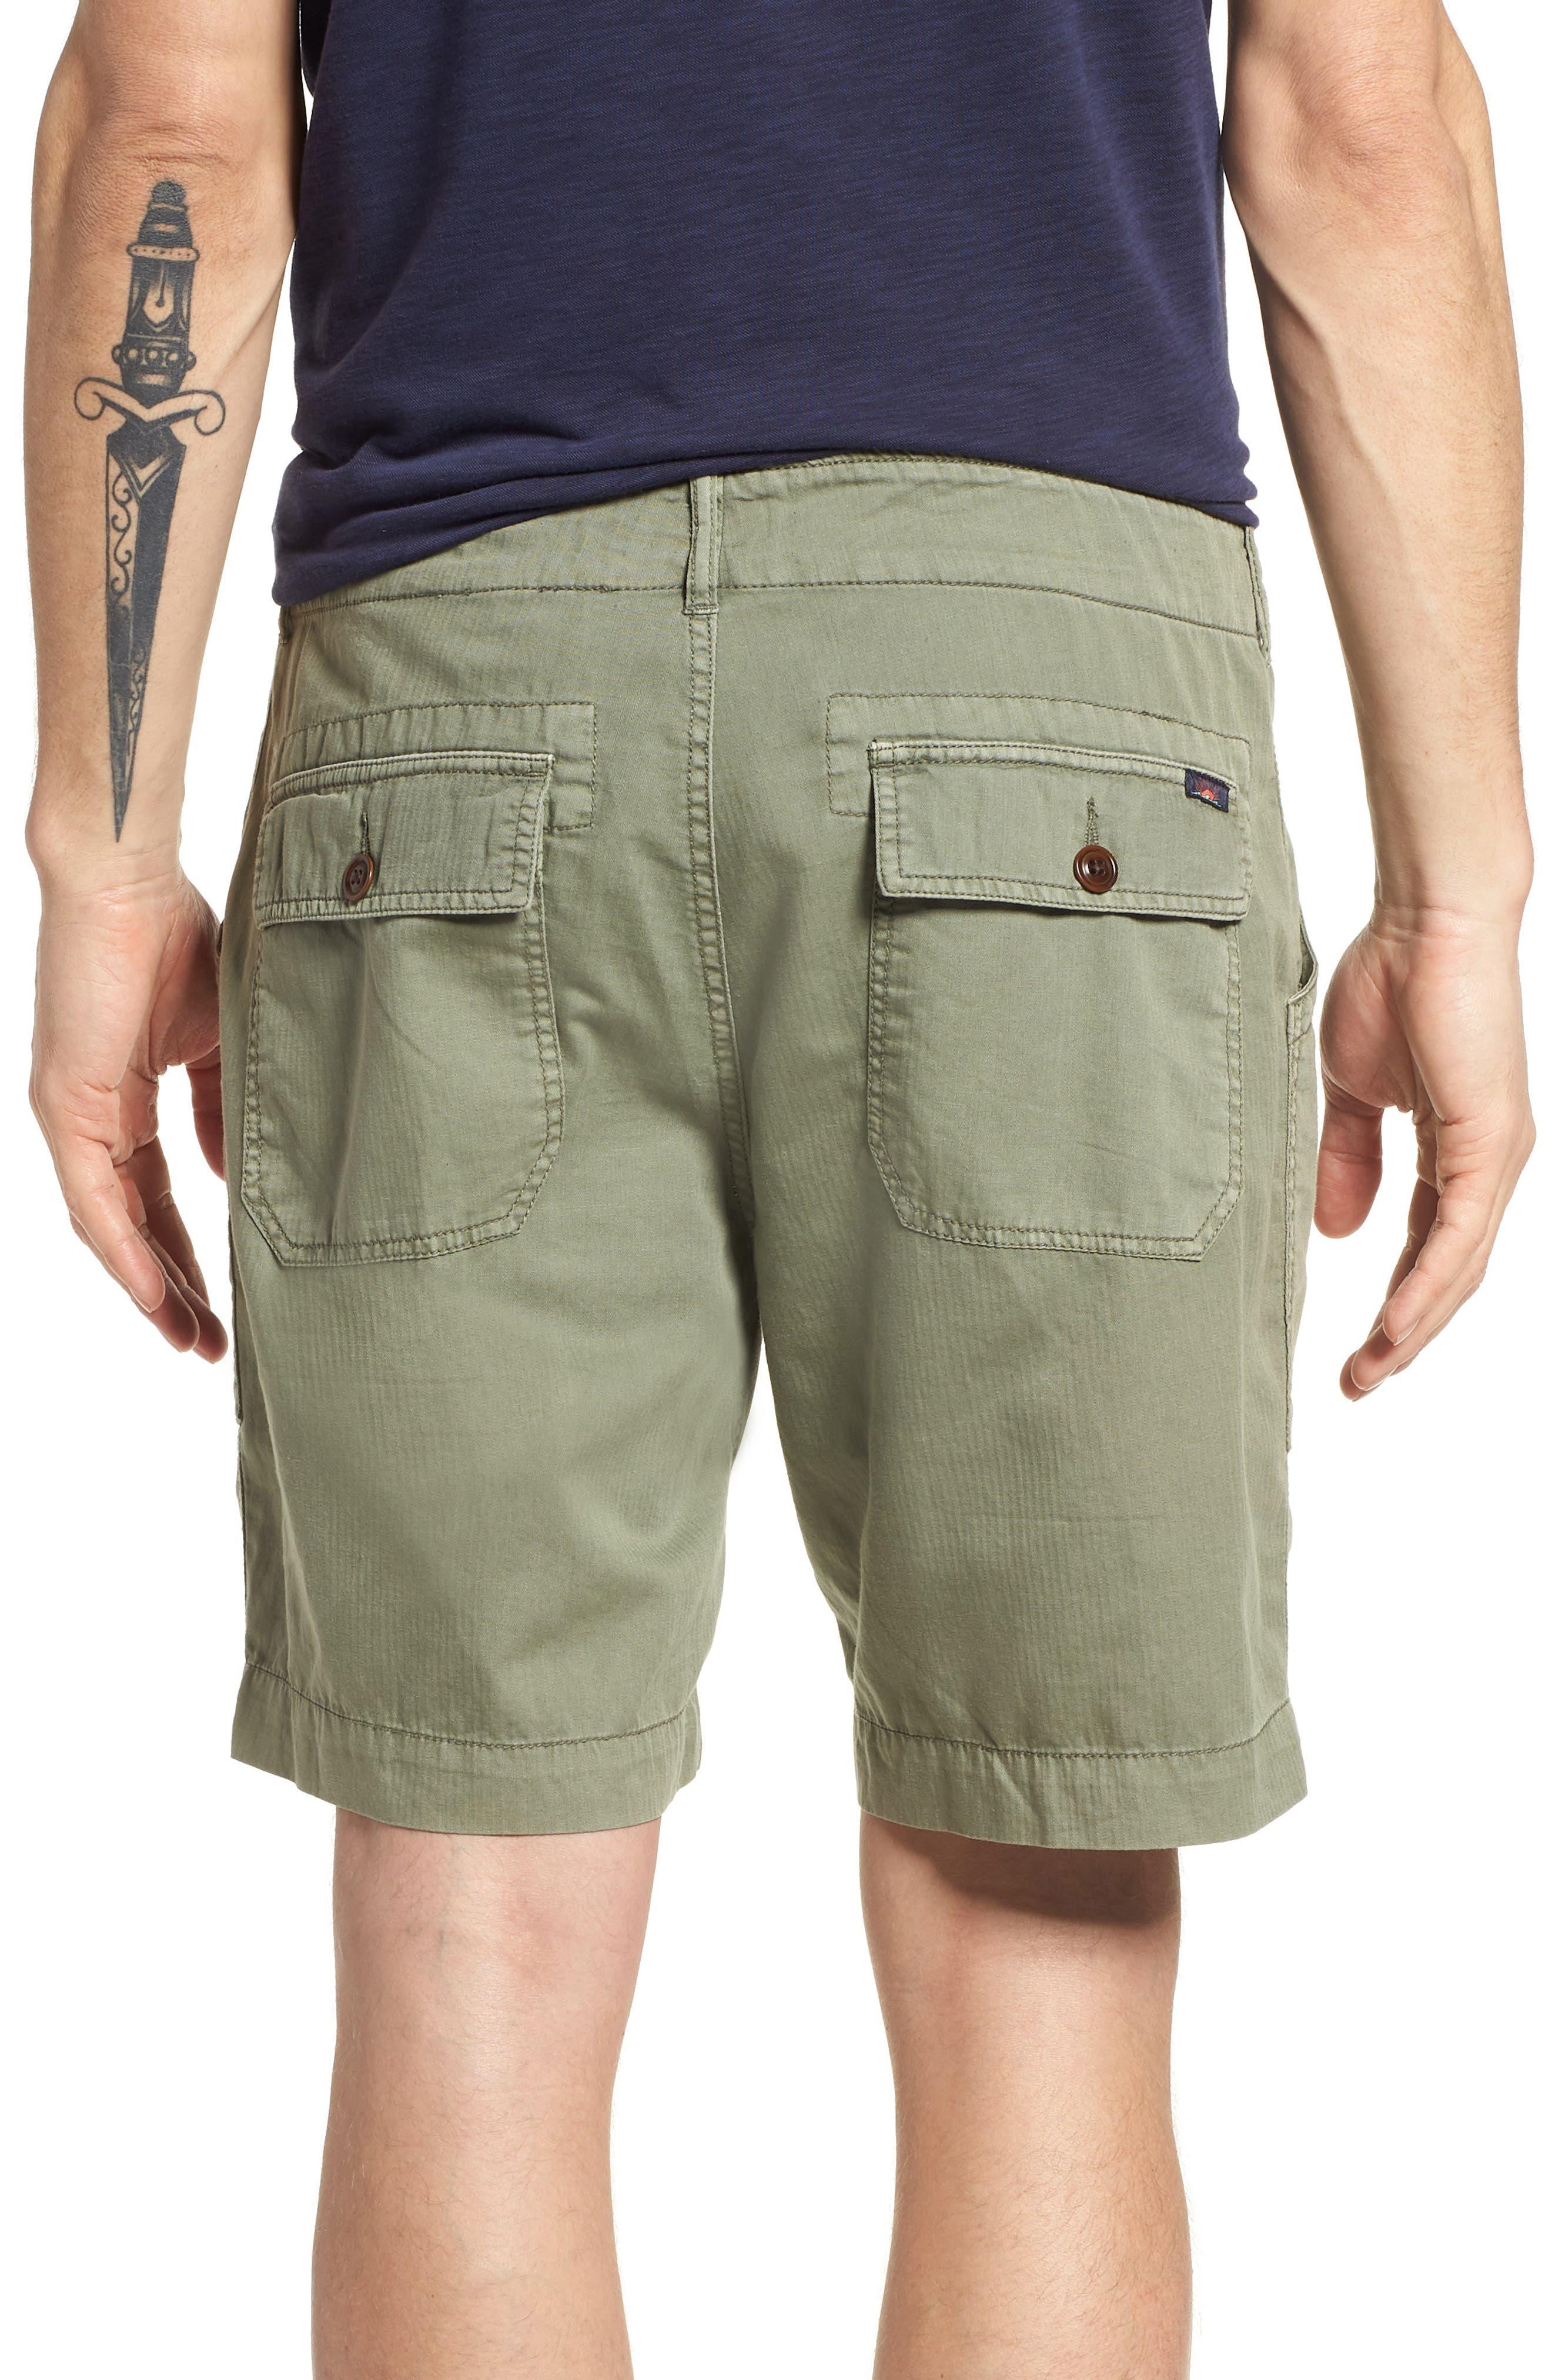 Radar Camp Shorts,                             Alternate thumbnail 2, color,                             Olive